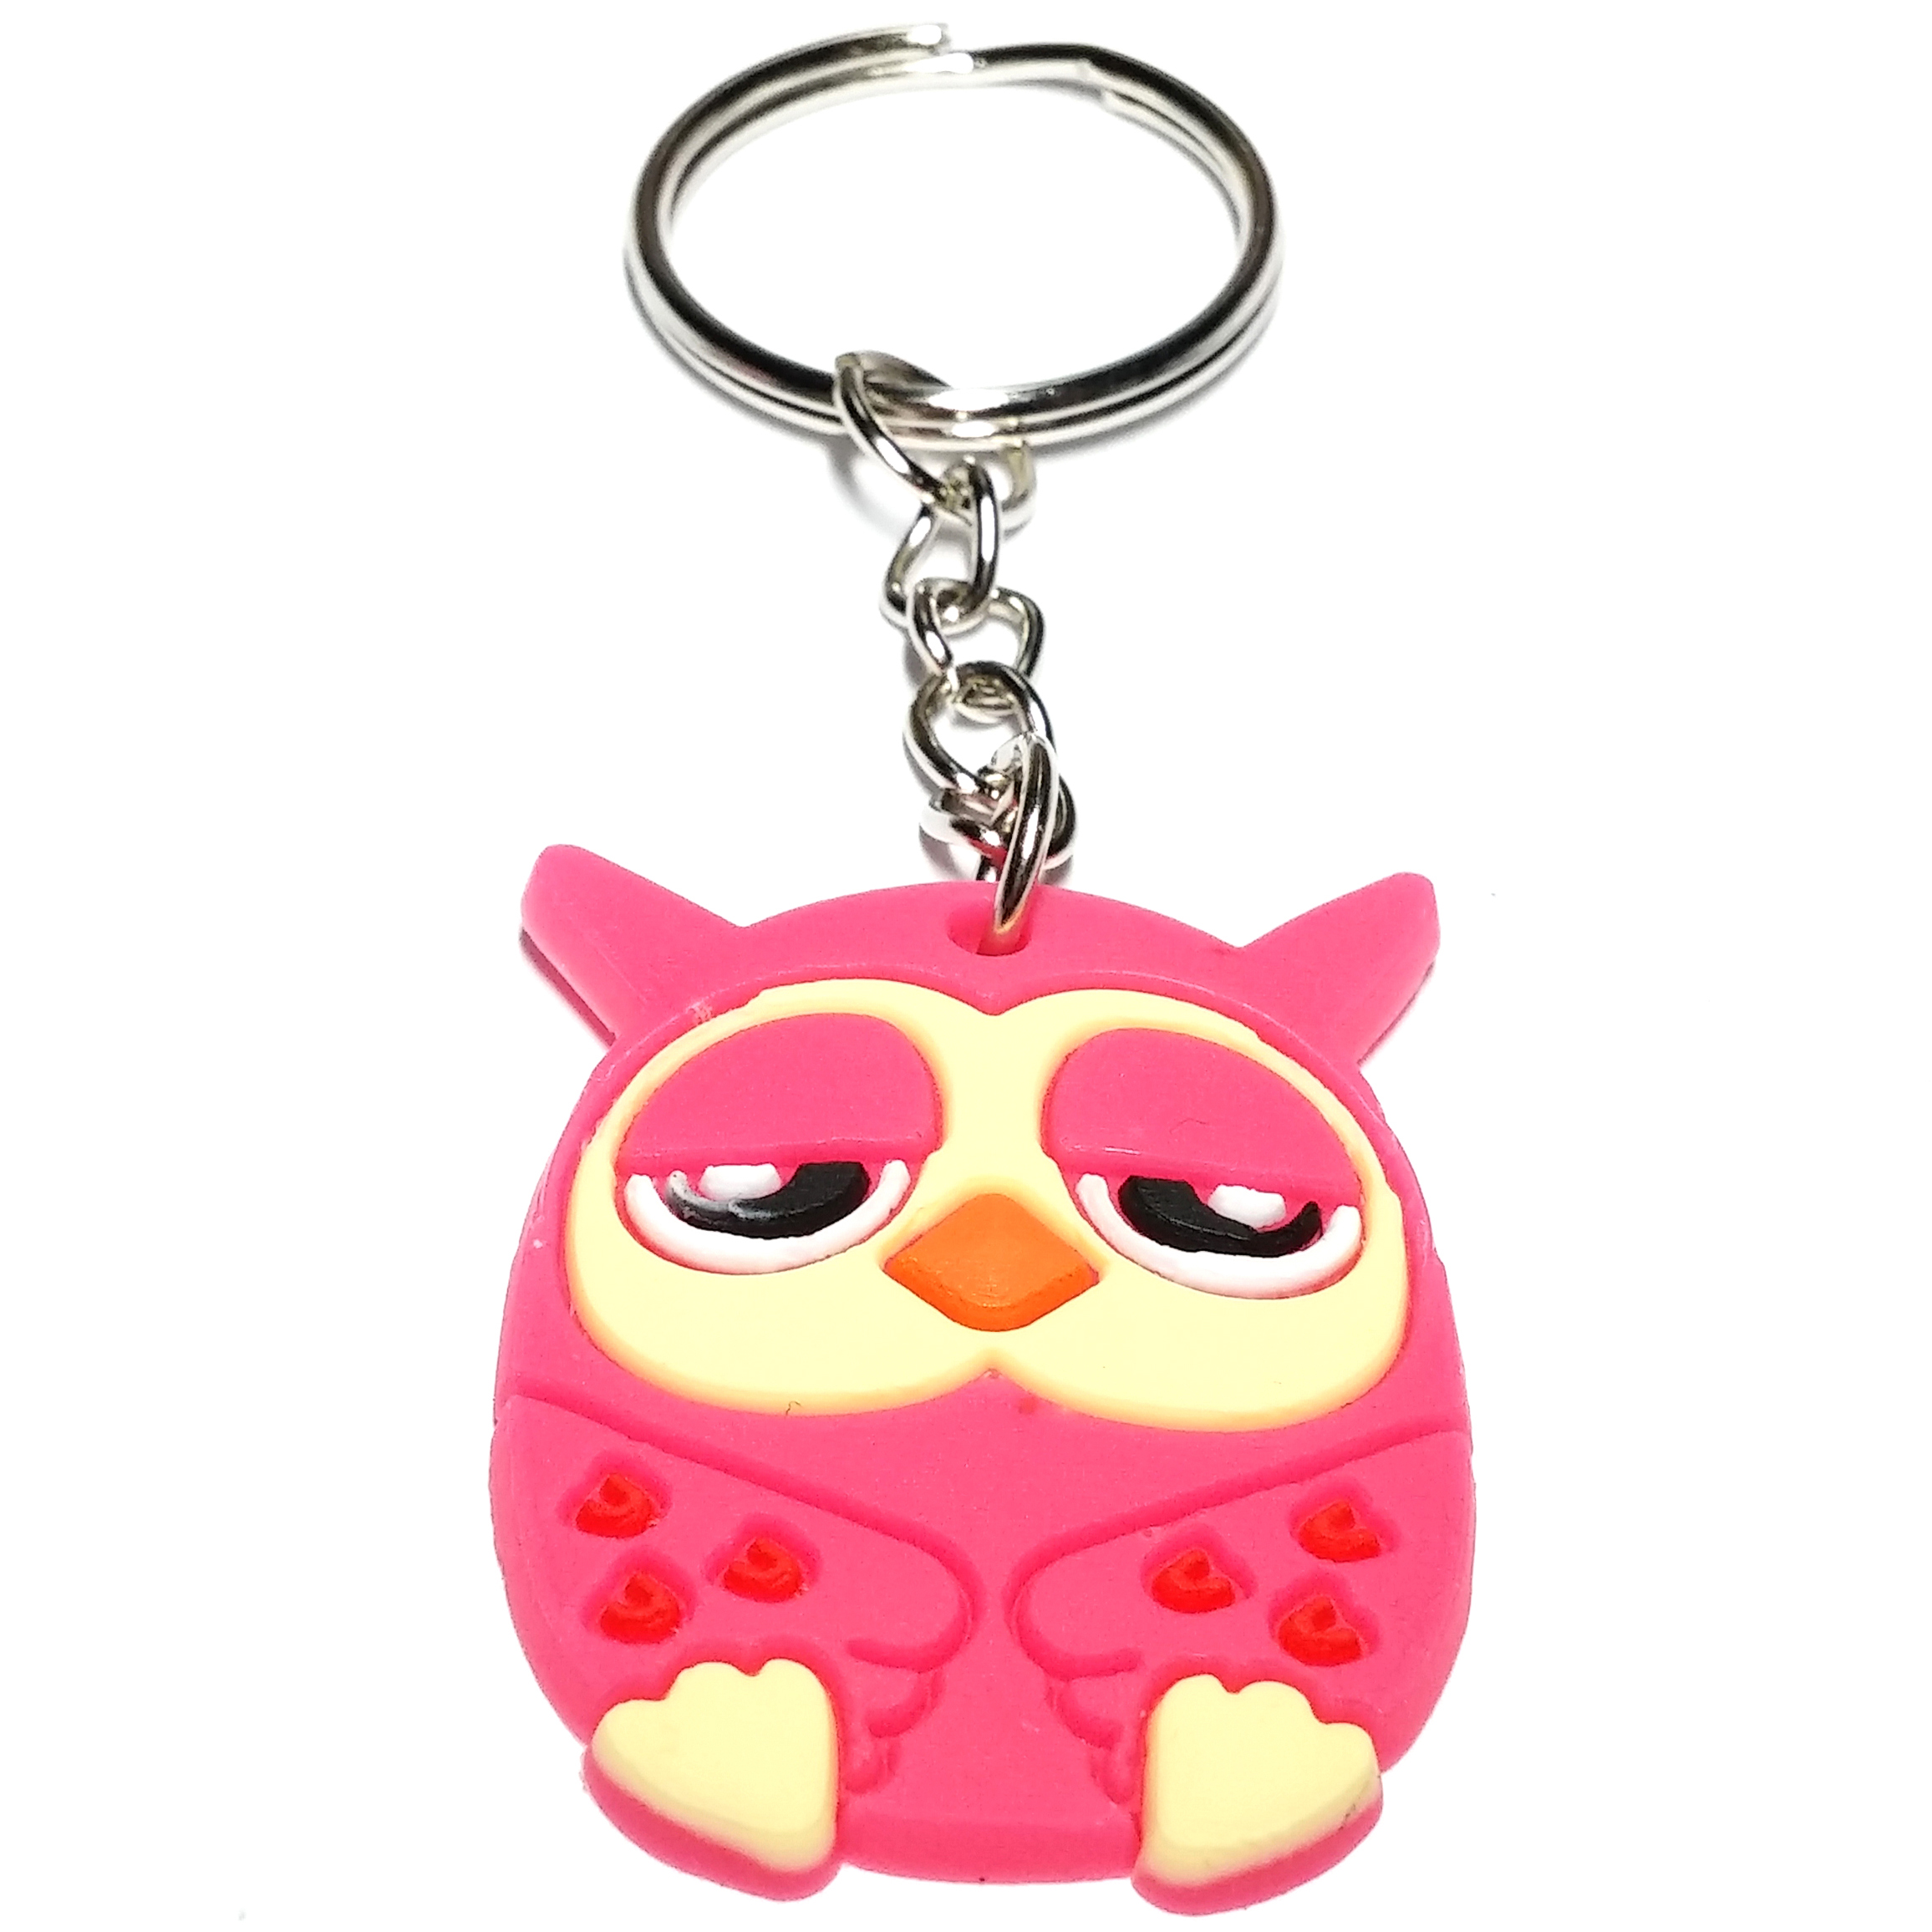 Porte clé plastique chouette cartoon rose